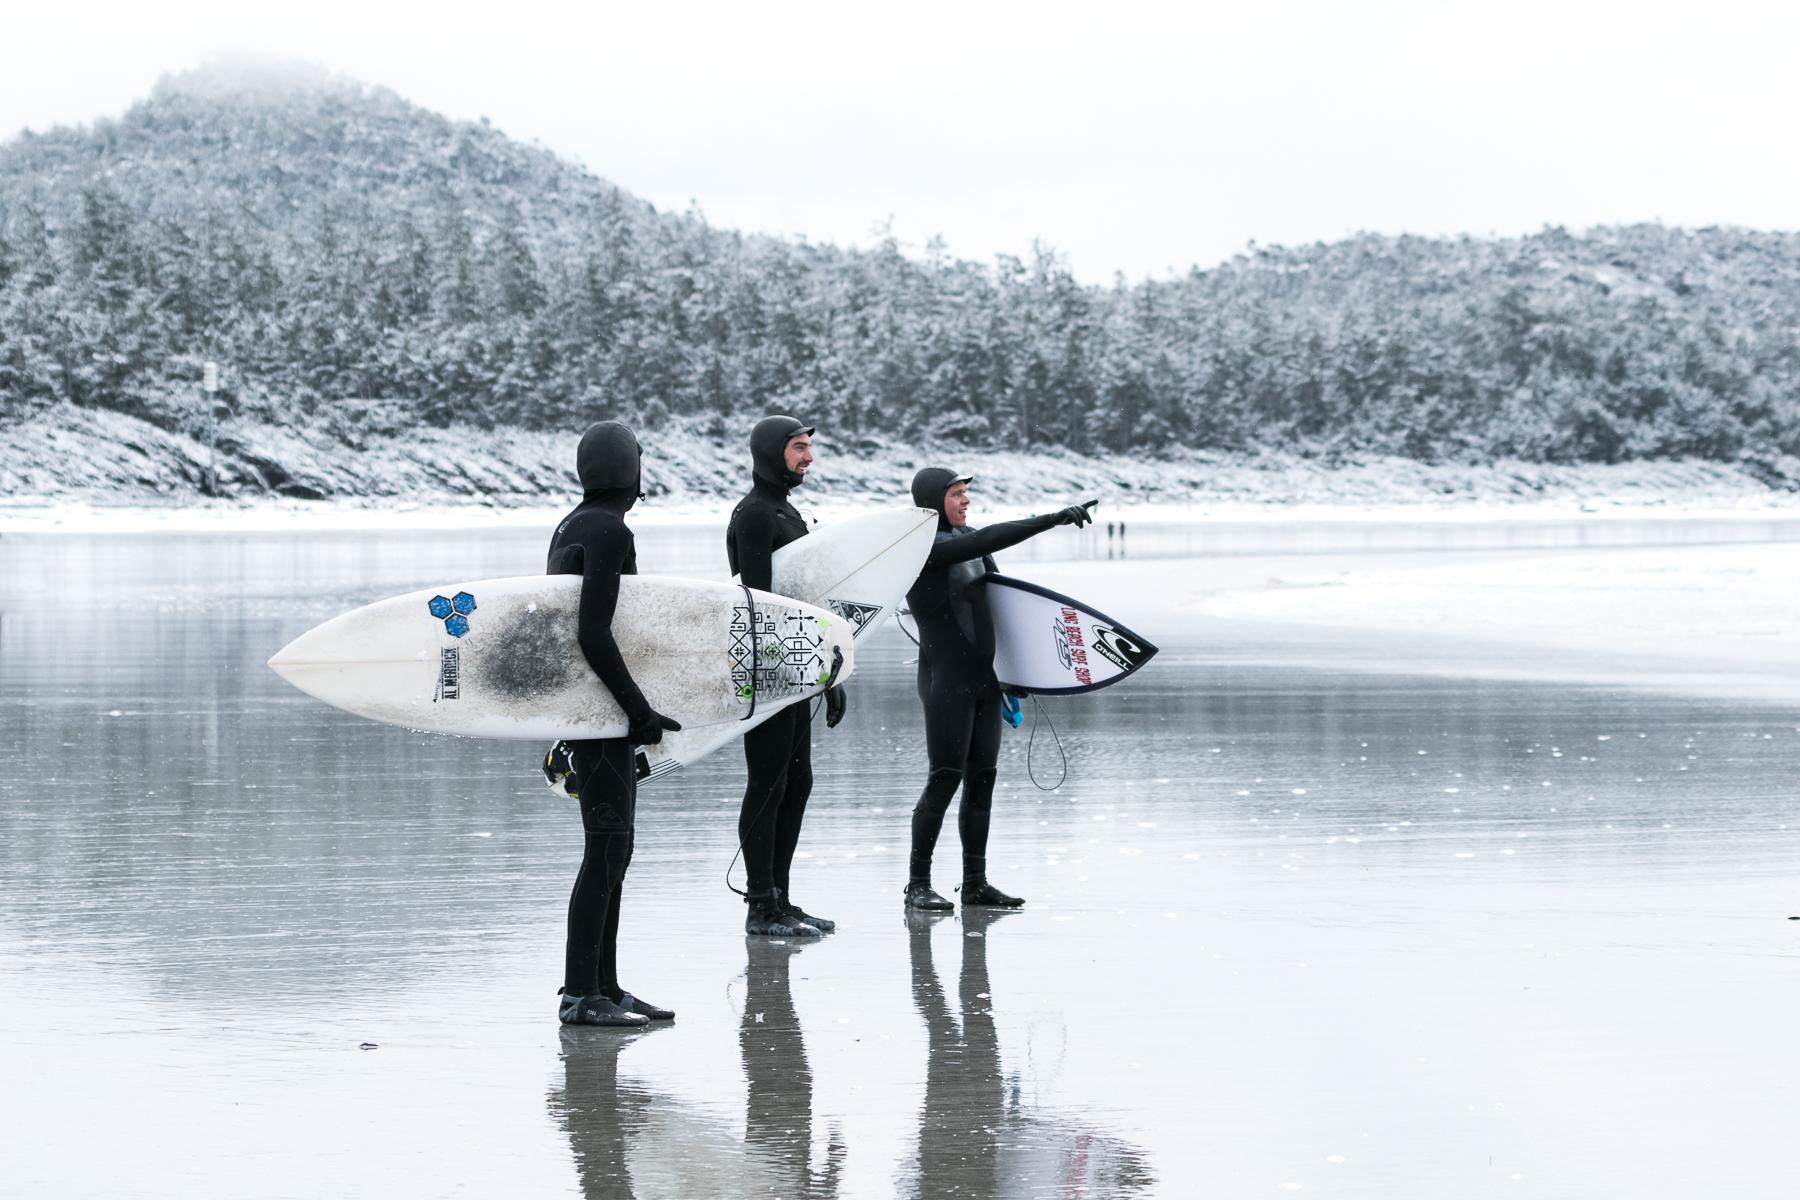 Tofino Surf Photography - Frozen Tundra Surfers